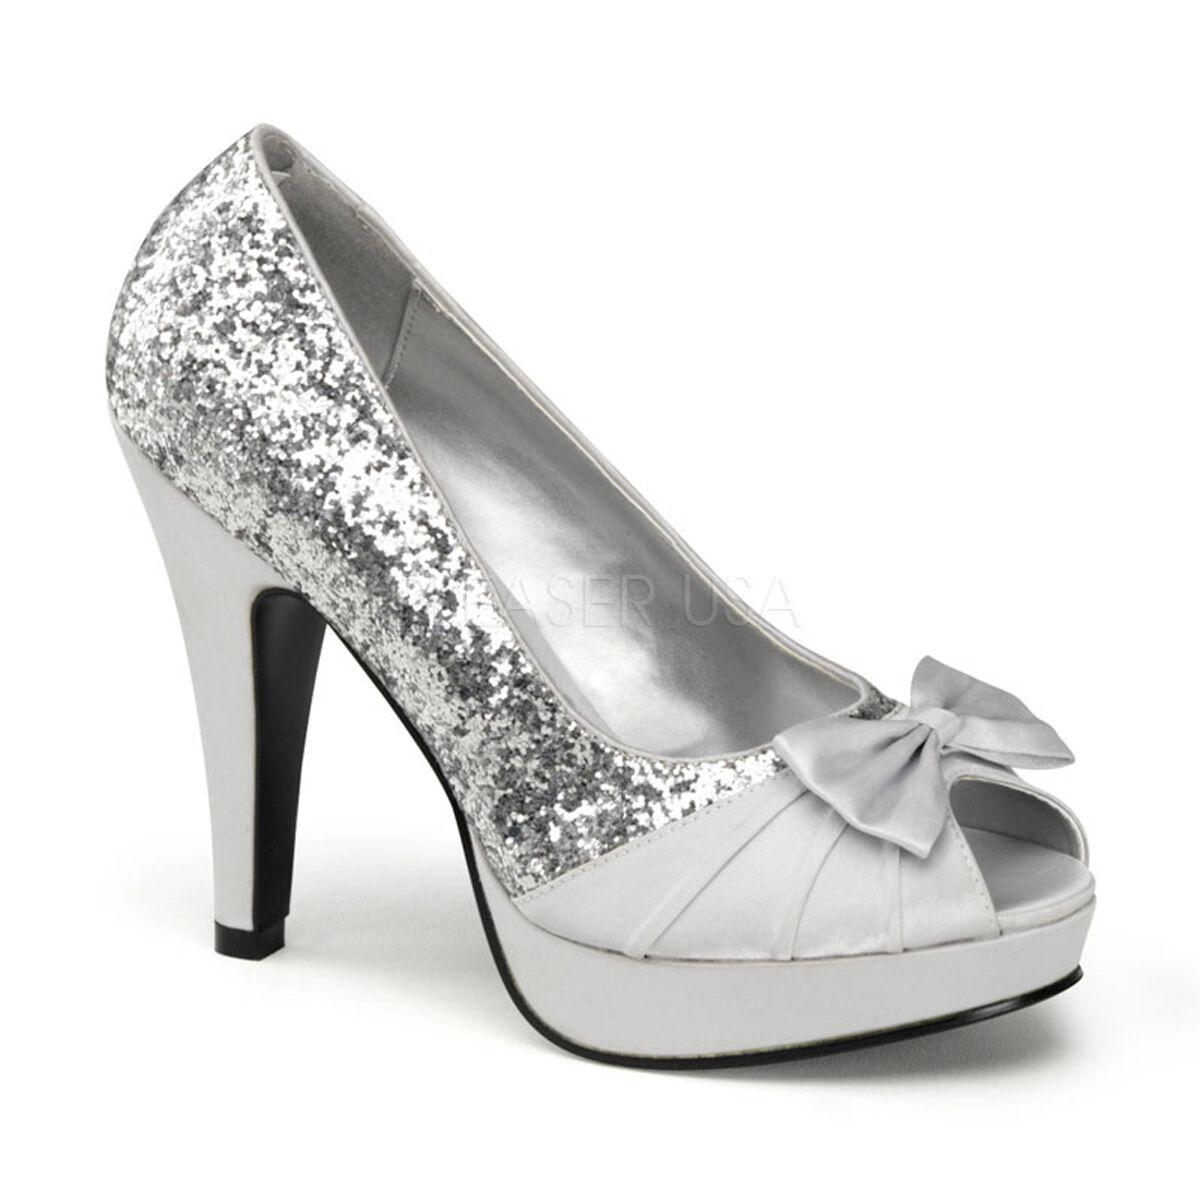 PINUP Sexy Silver Glitter Satin Peep Toe Evening Party Heels Schuhes BETT10/SG-SA